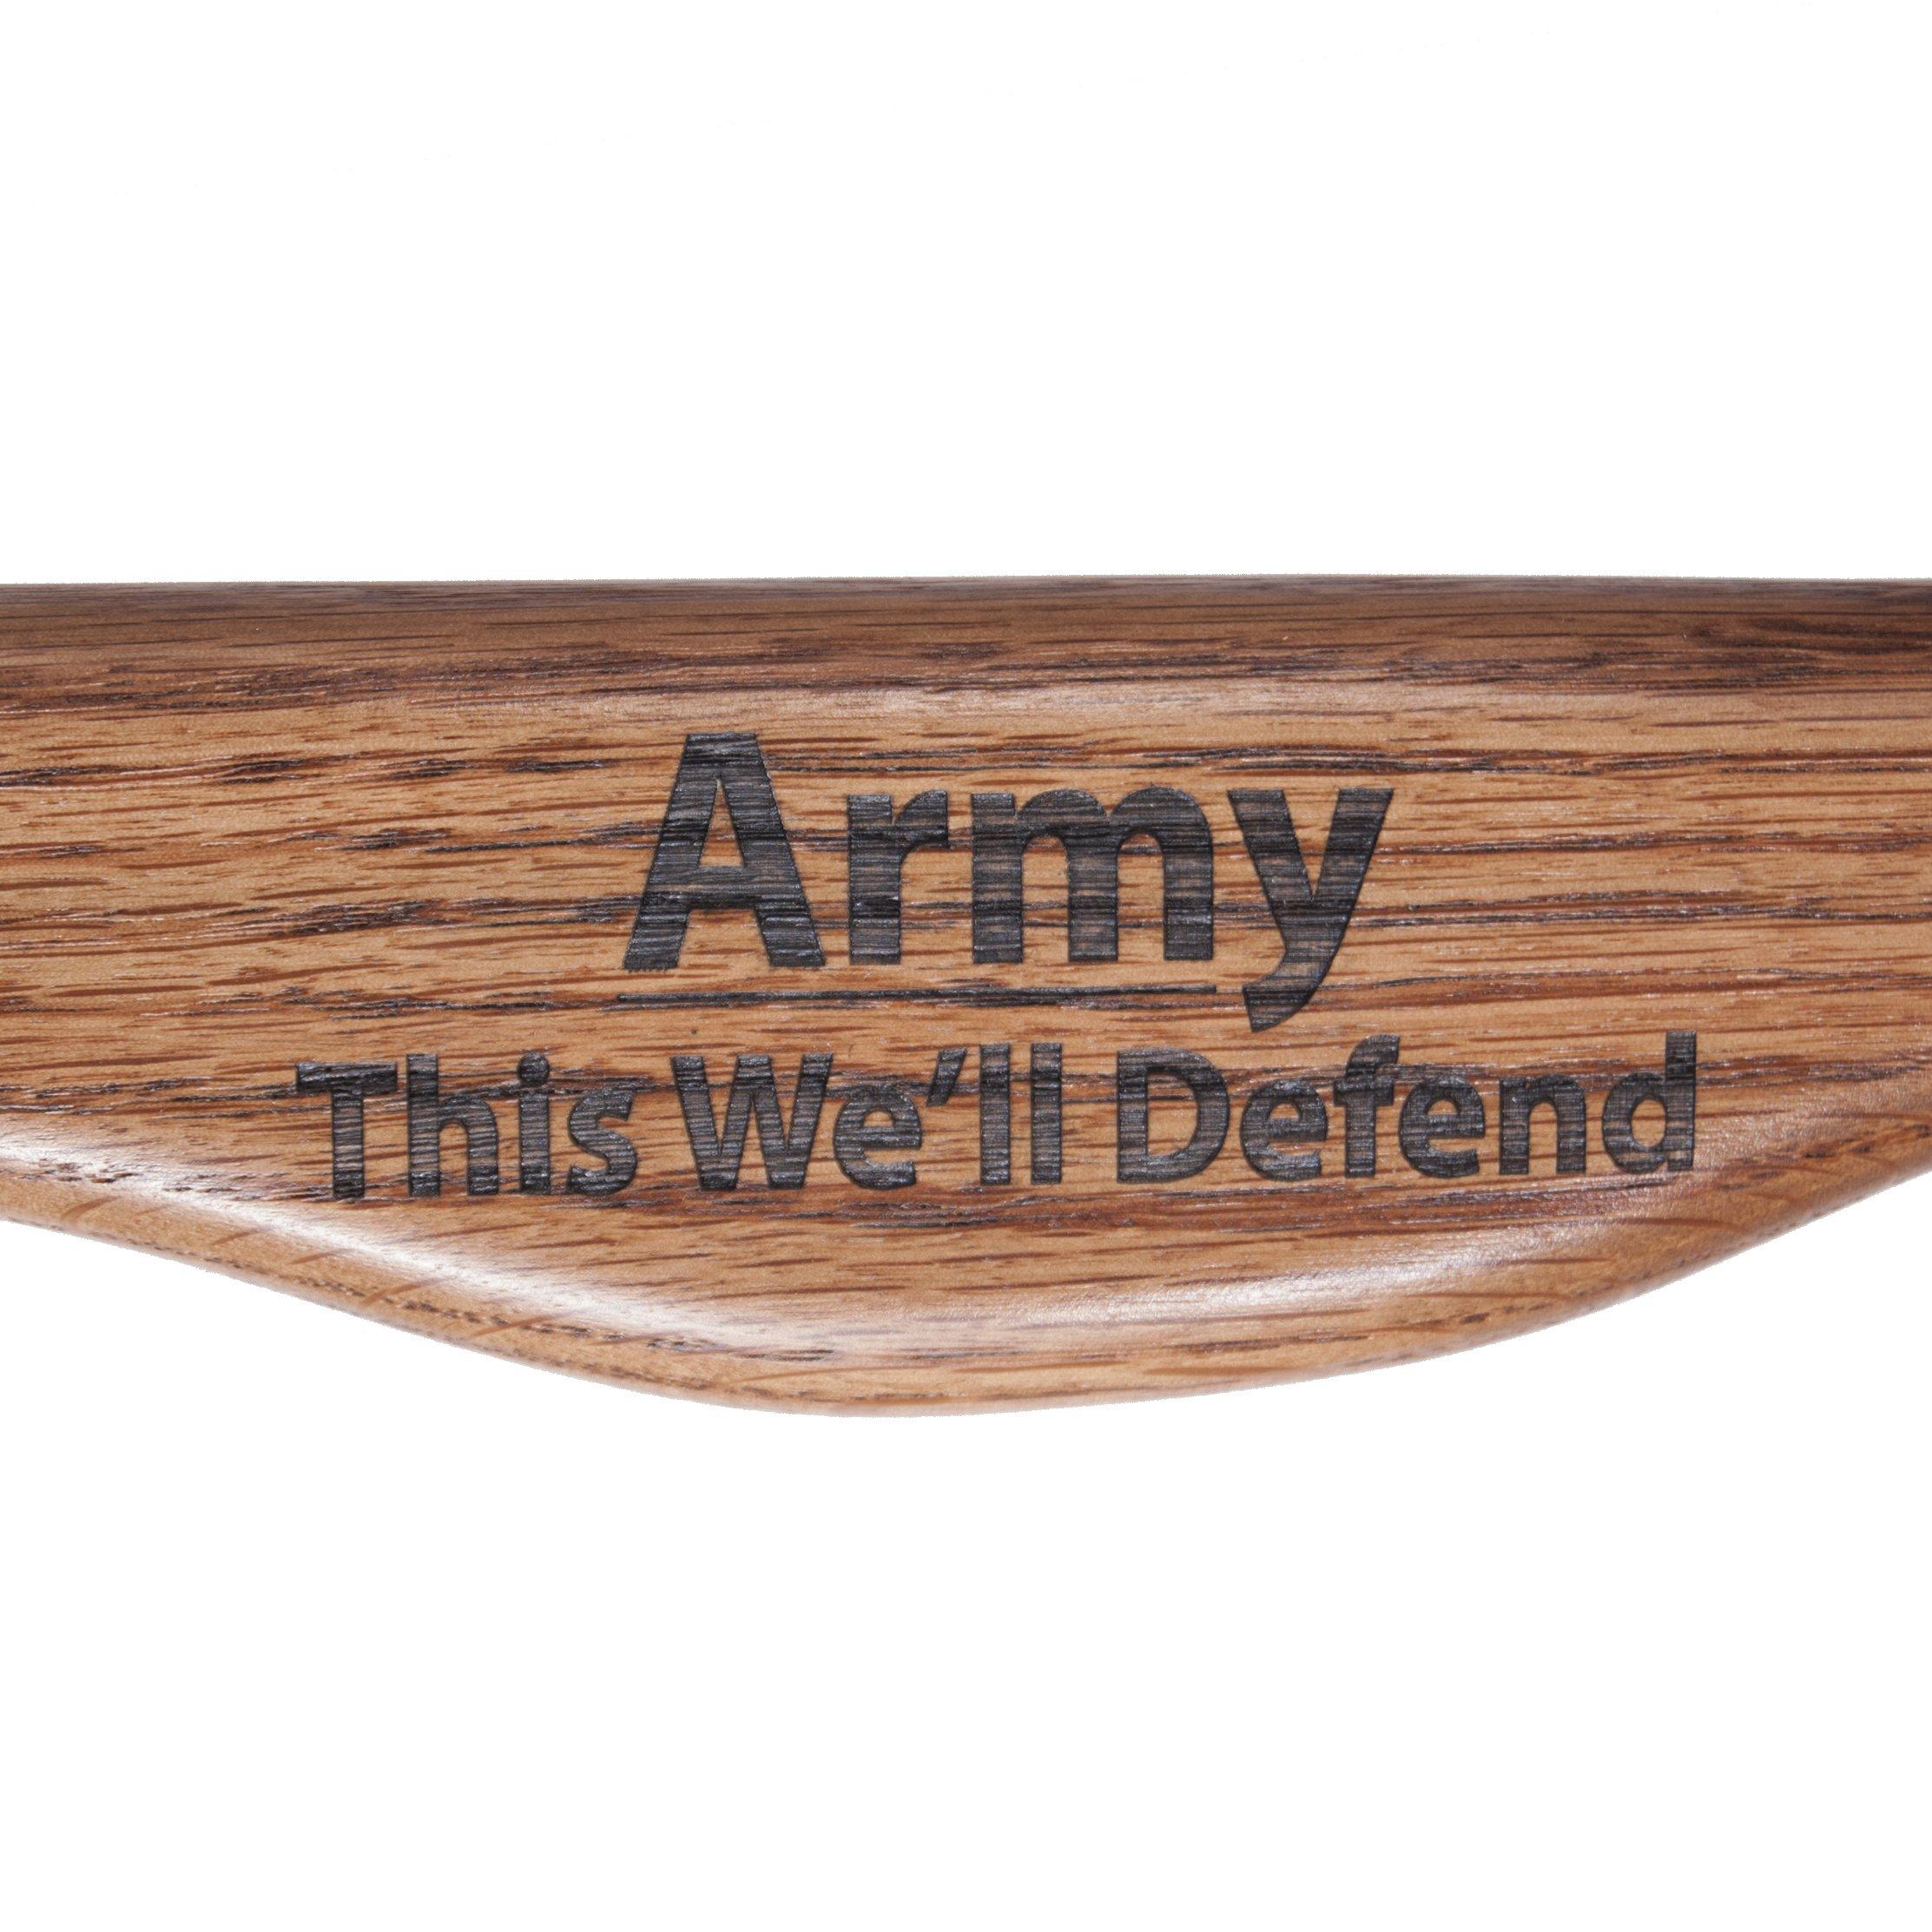 Brazos 55'' Oak Wood Walking and Hiking Stick, Army Legacy Staff by Brazos (Image #4)